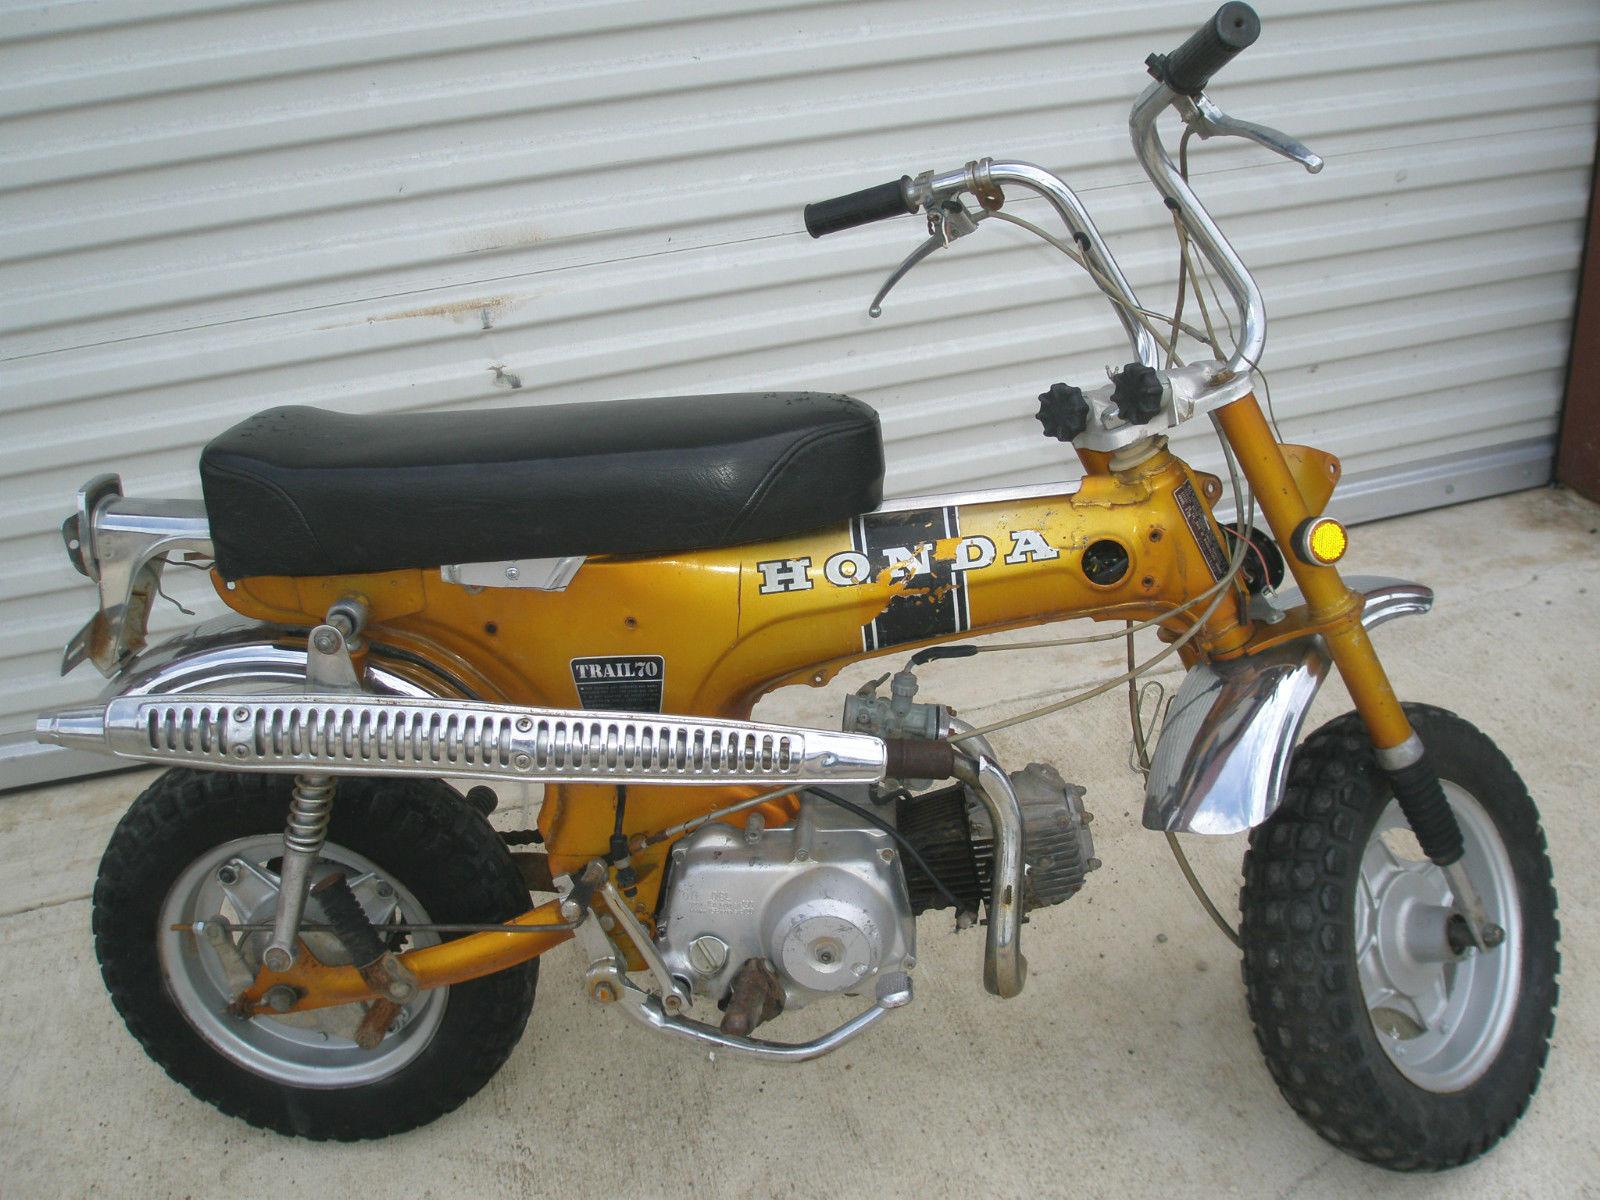 1969 Honda CT70 K0 Trail 70 Mfd 9 69 Candy Gold NICE Chrome